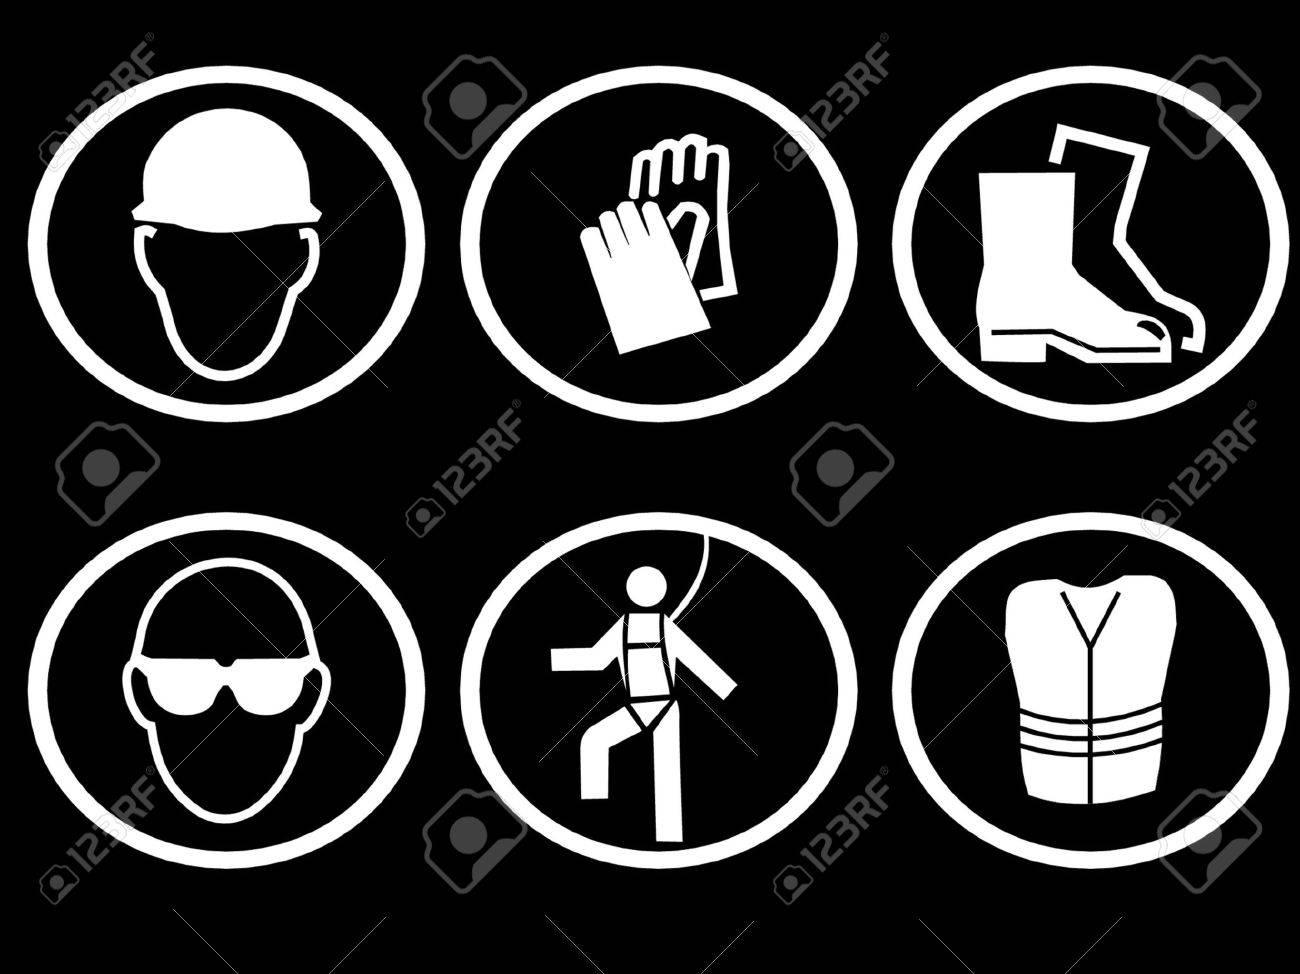 Construction site safety equipment symbols royalty free cliparts construction site safety equipment symbols stock vector 779561 buycottarizona